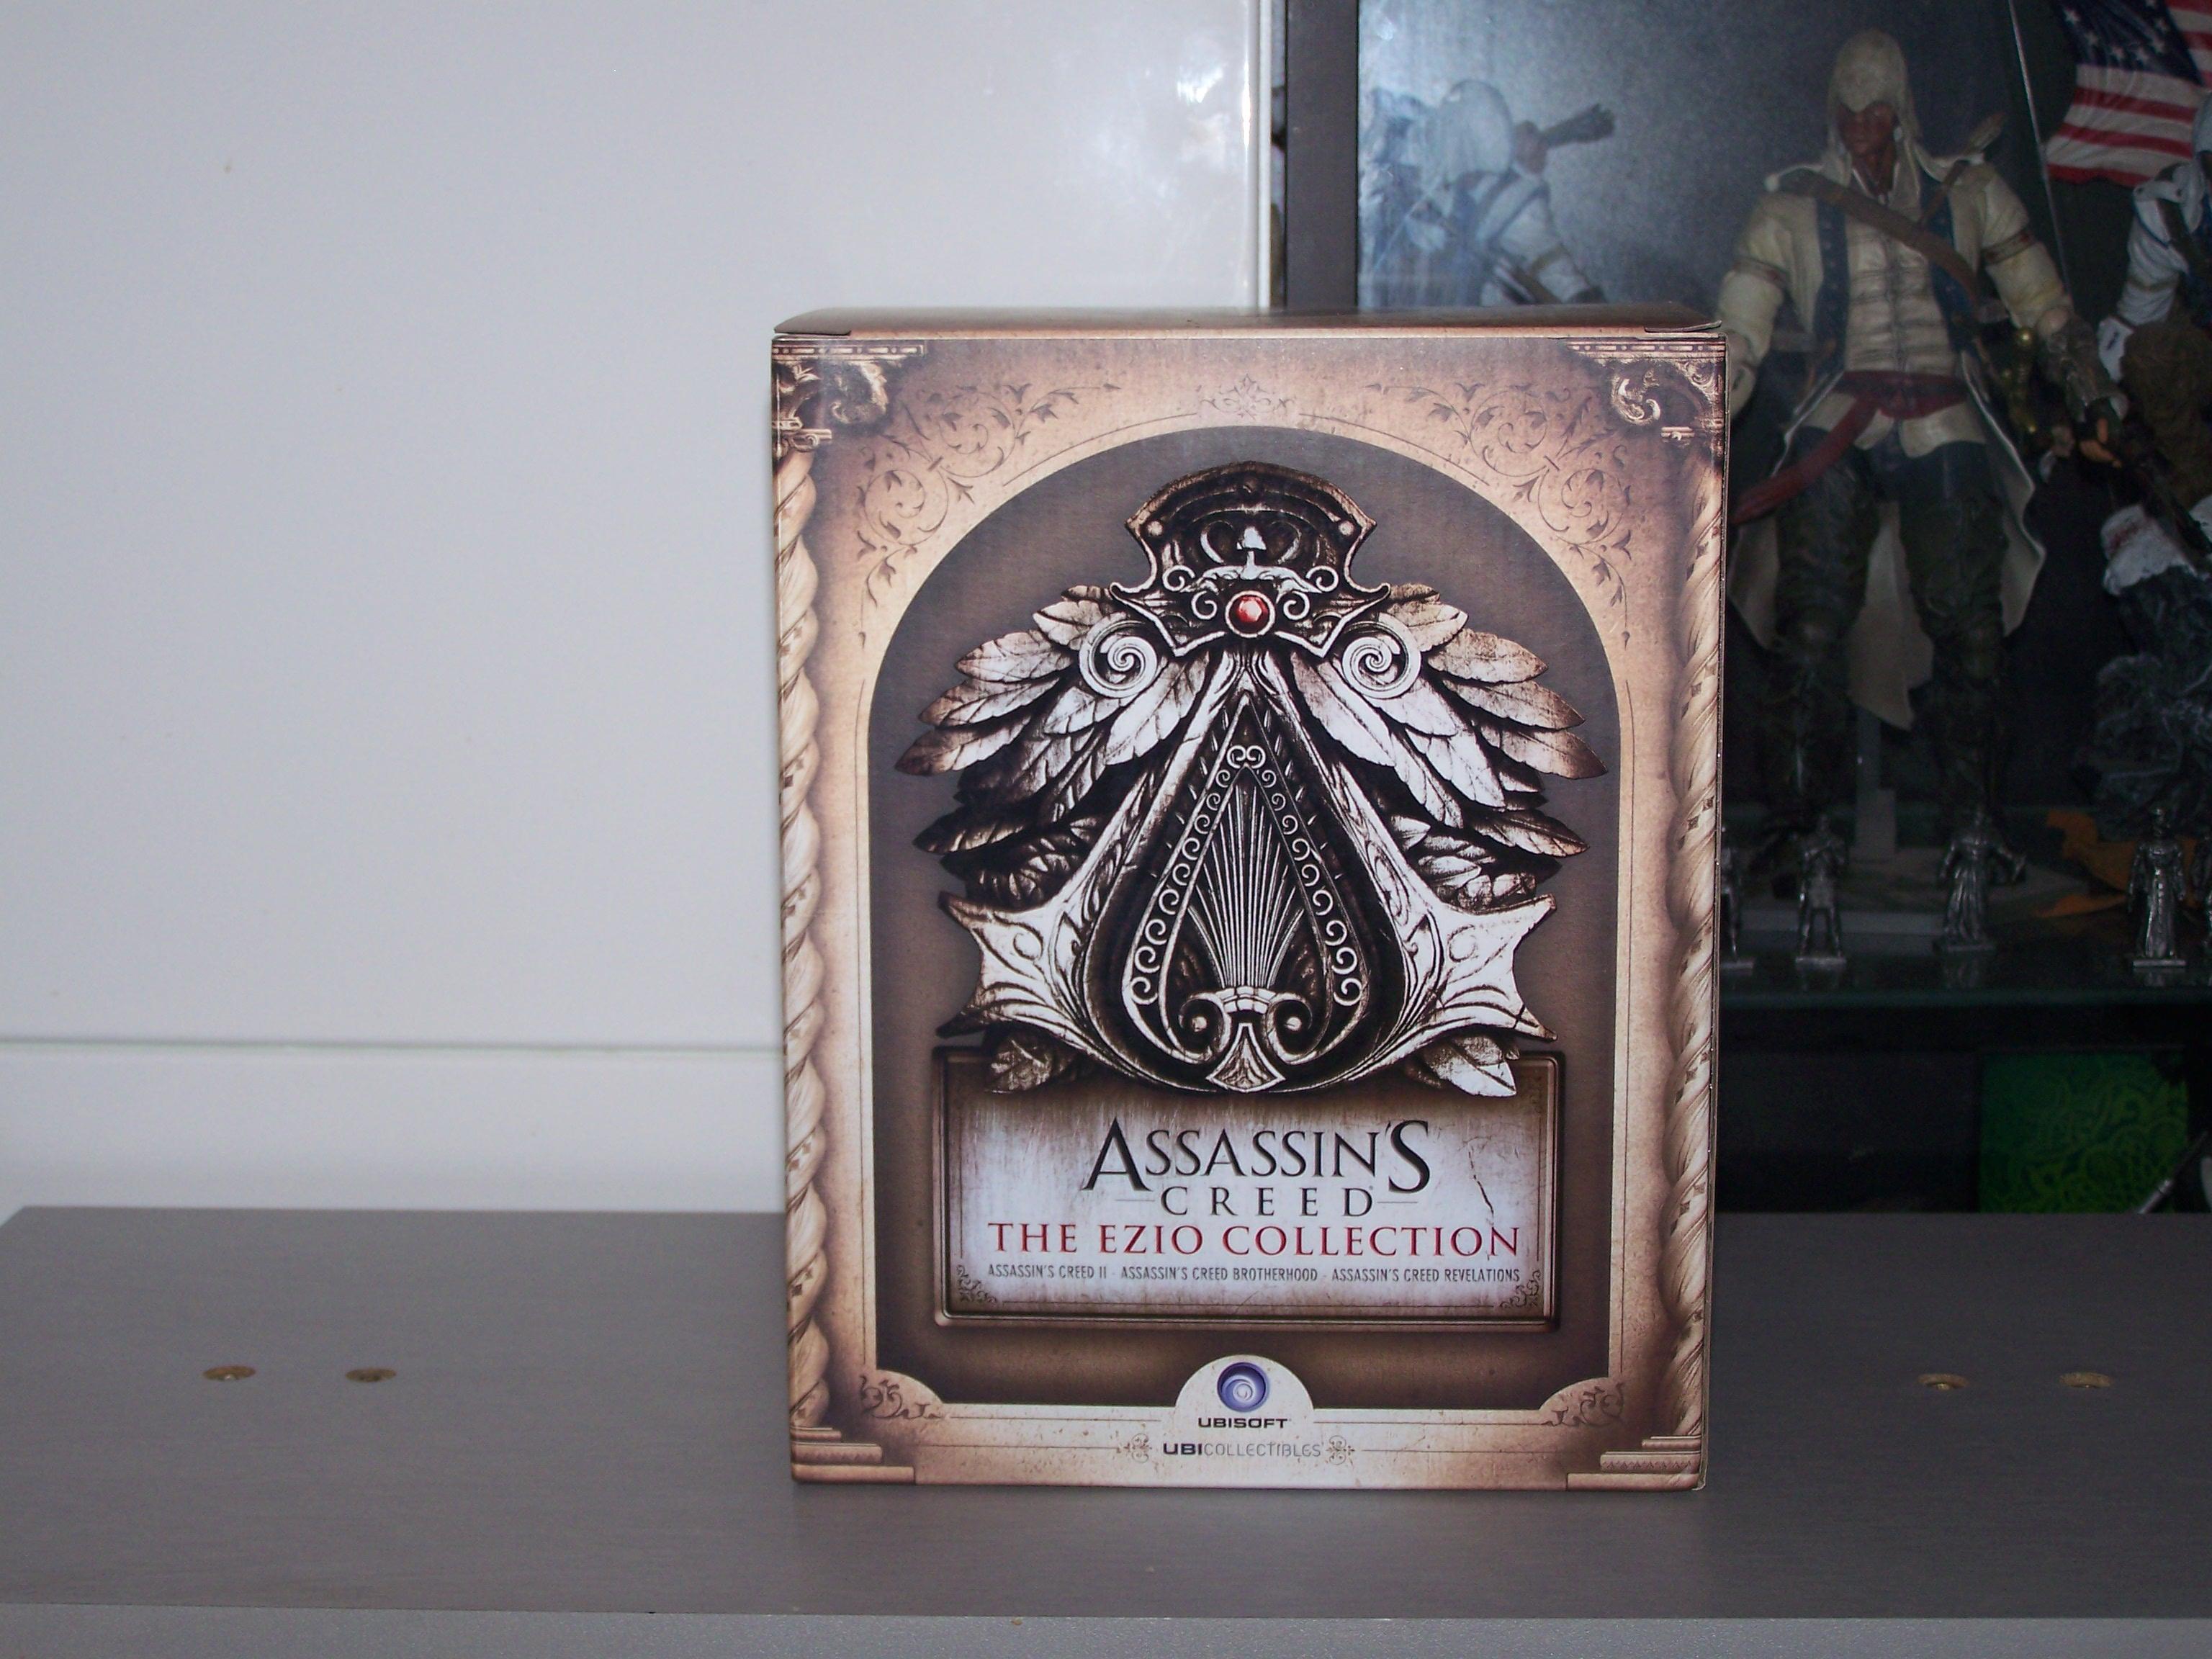 Assassin's Creed Ezio Collection Edition Collector